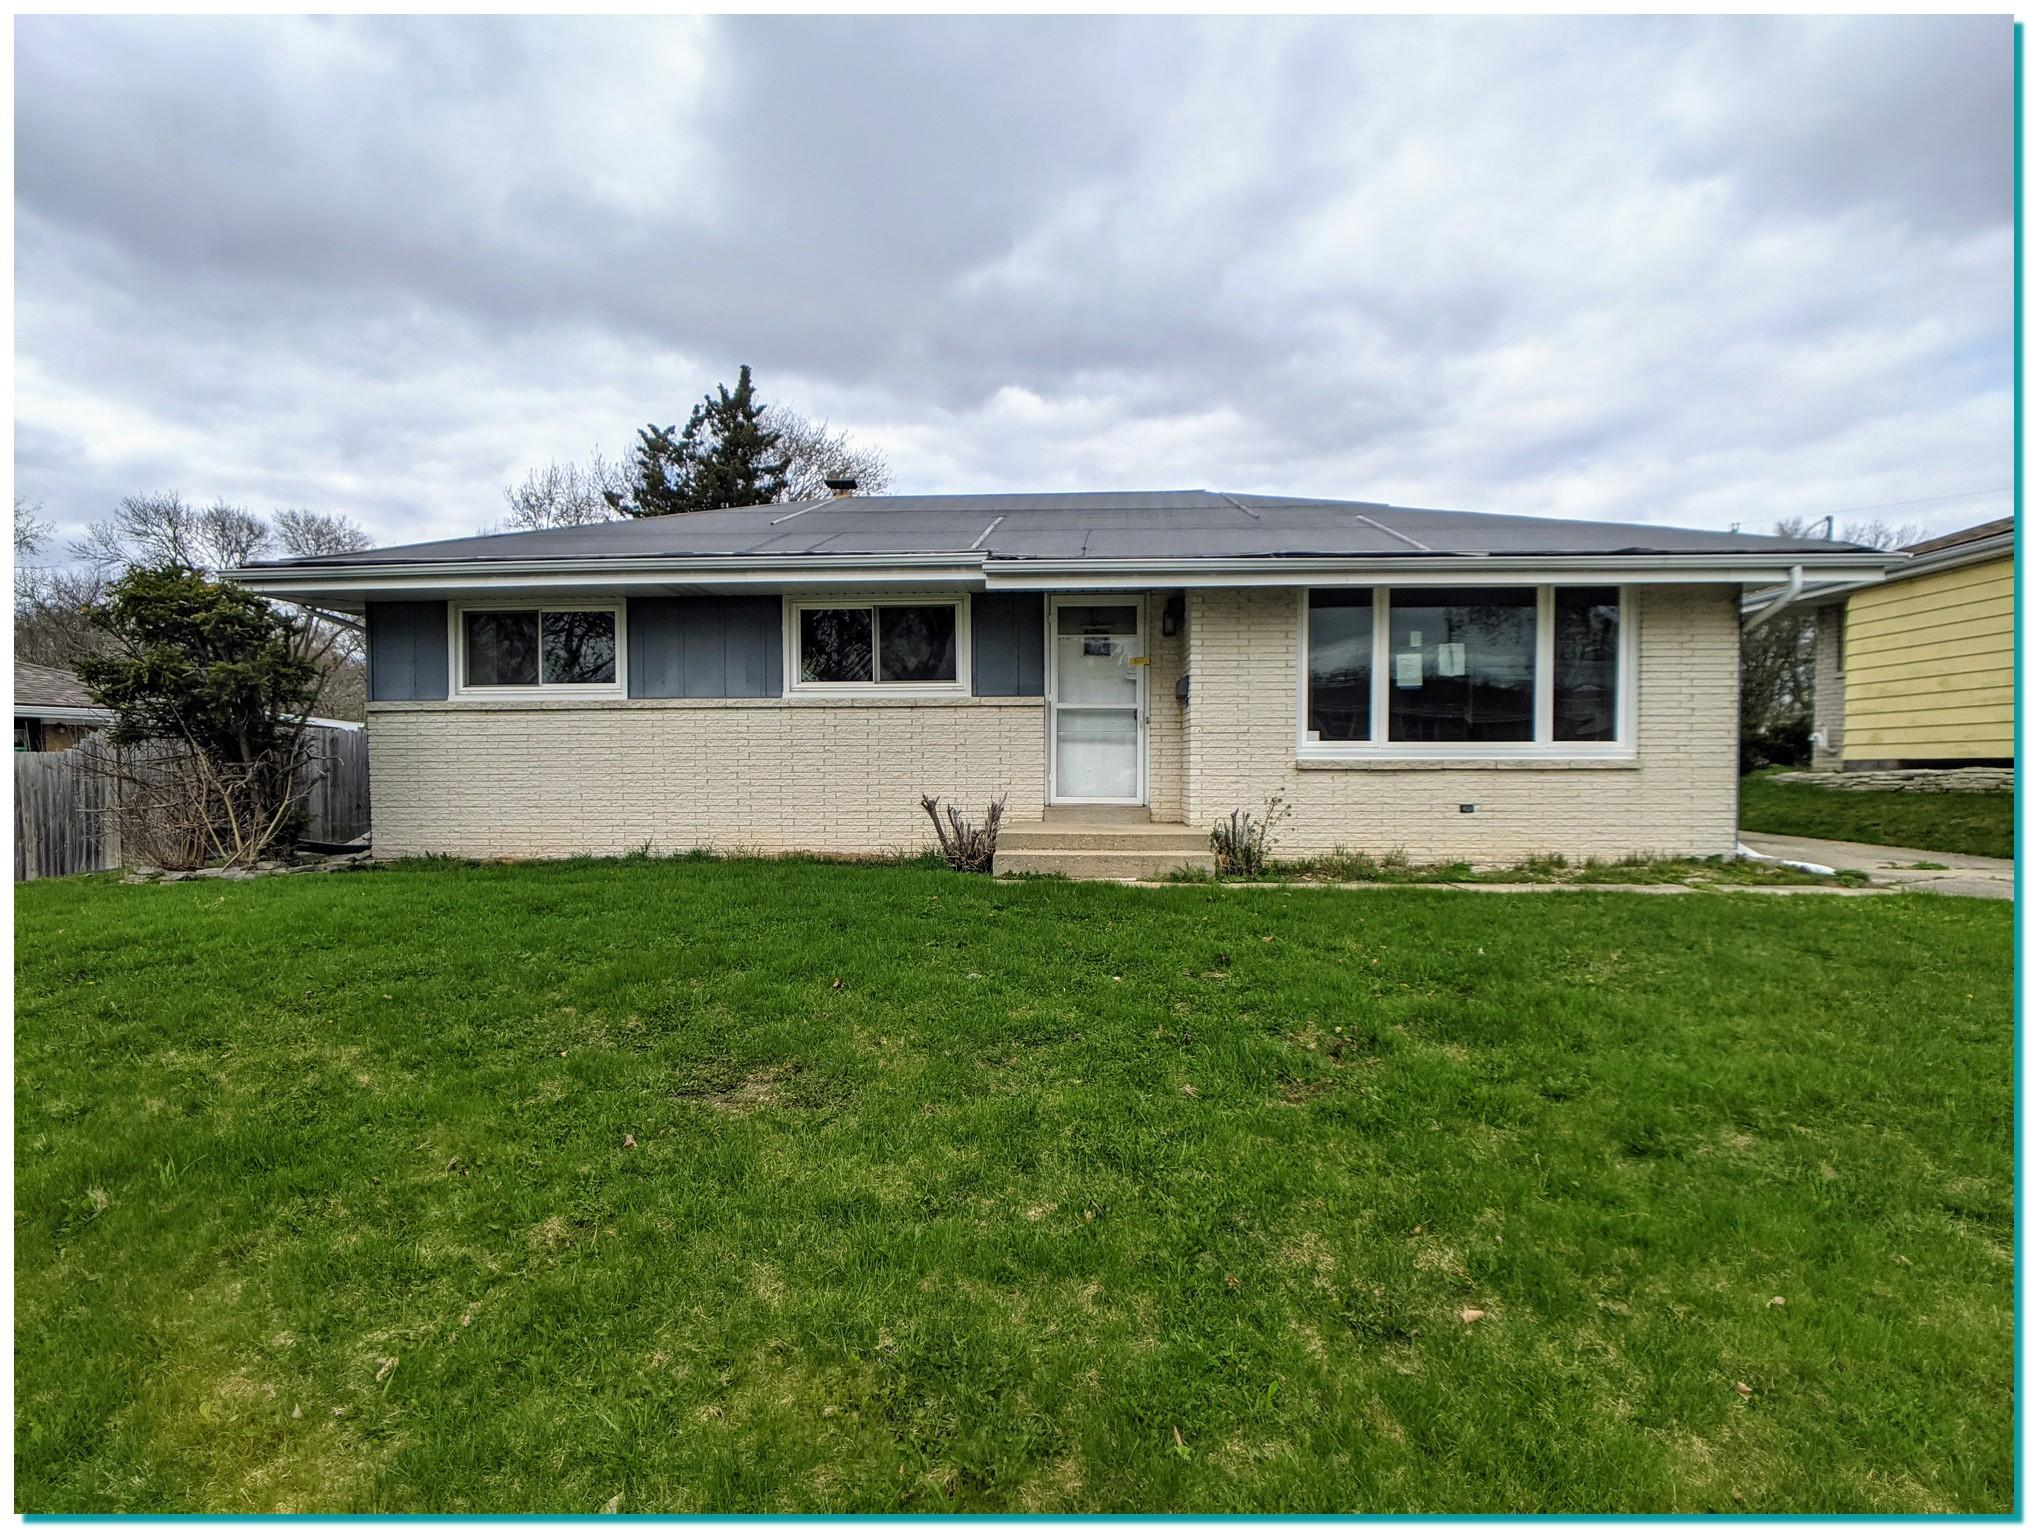 10908 Harvest Ln, Milwaukee, Wisconsin 53225, 3 Bedrooms Bedrooms, 5 Rooms Rooms,1 BathroomBathrooms,Single-Family,For Sale,Harvest Ln,1735995